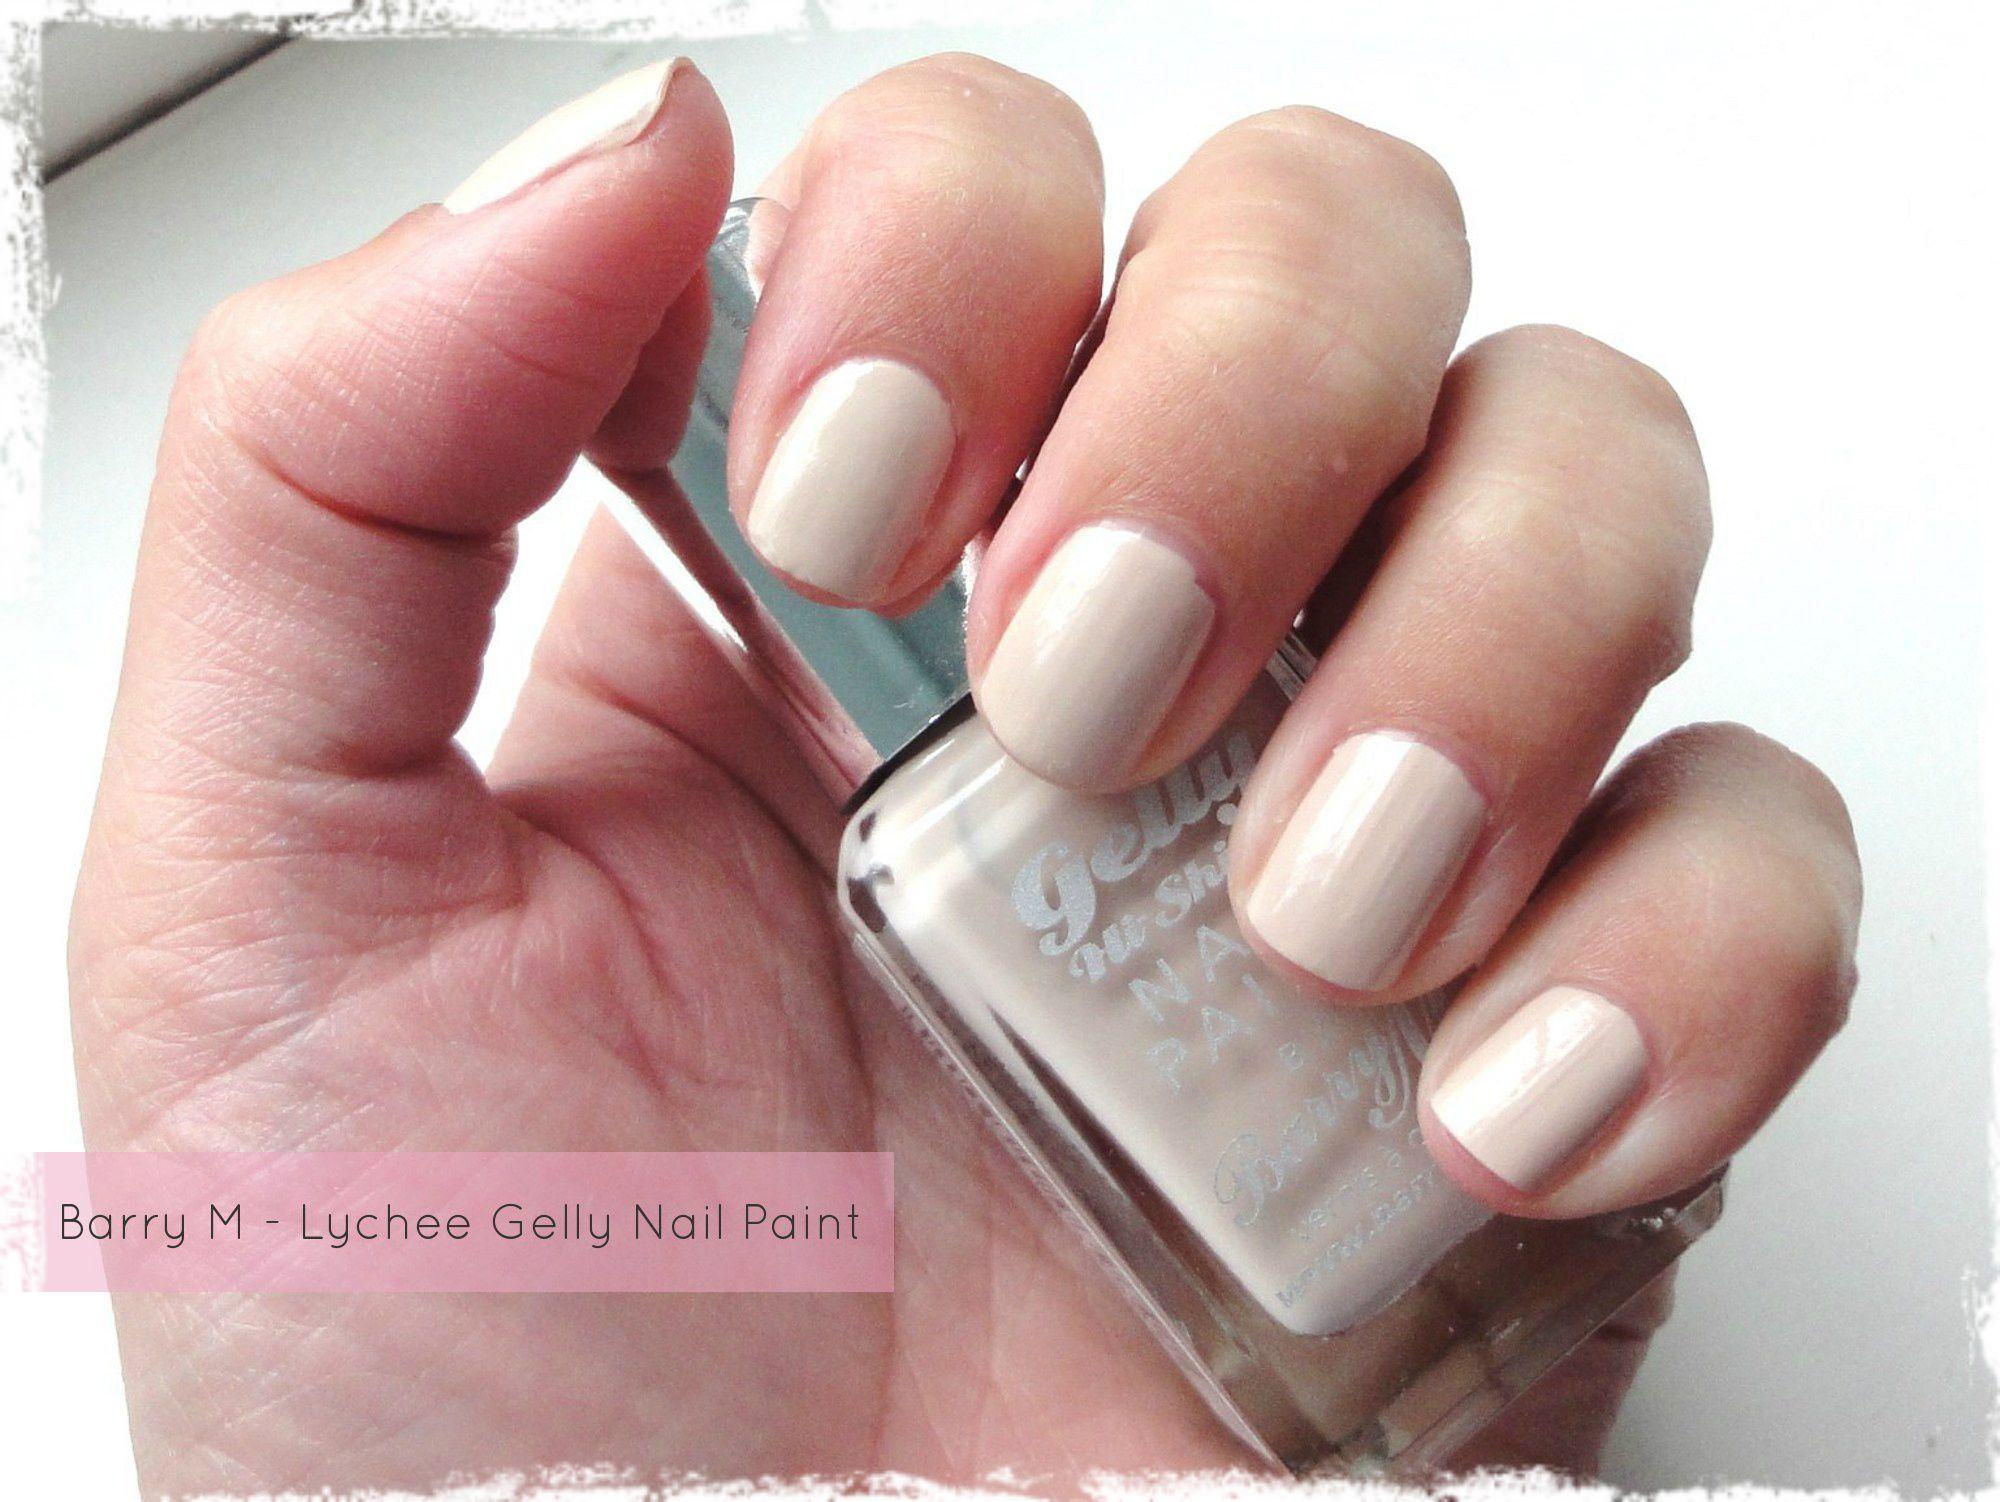 Barry M Gelly Nail Paint - Lychee | Nail Art Hacks | Pinterest | Art ...